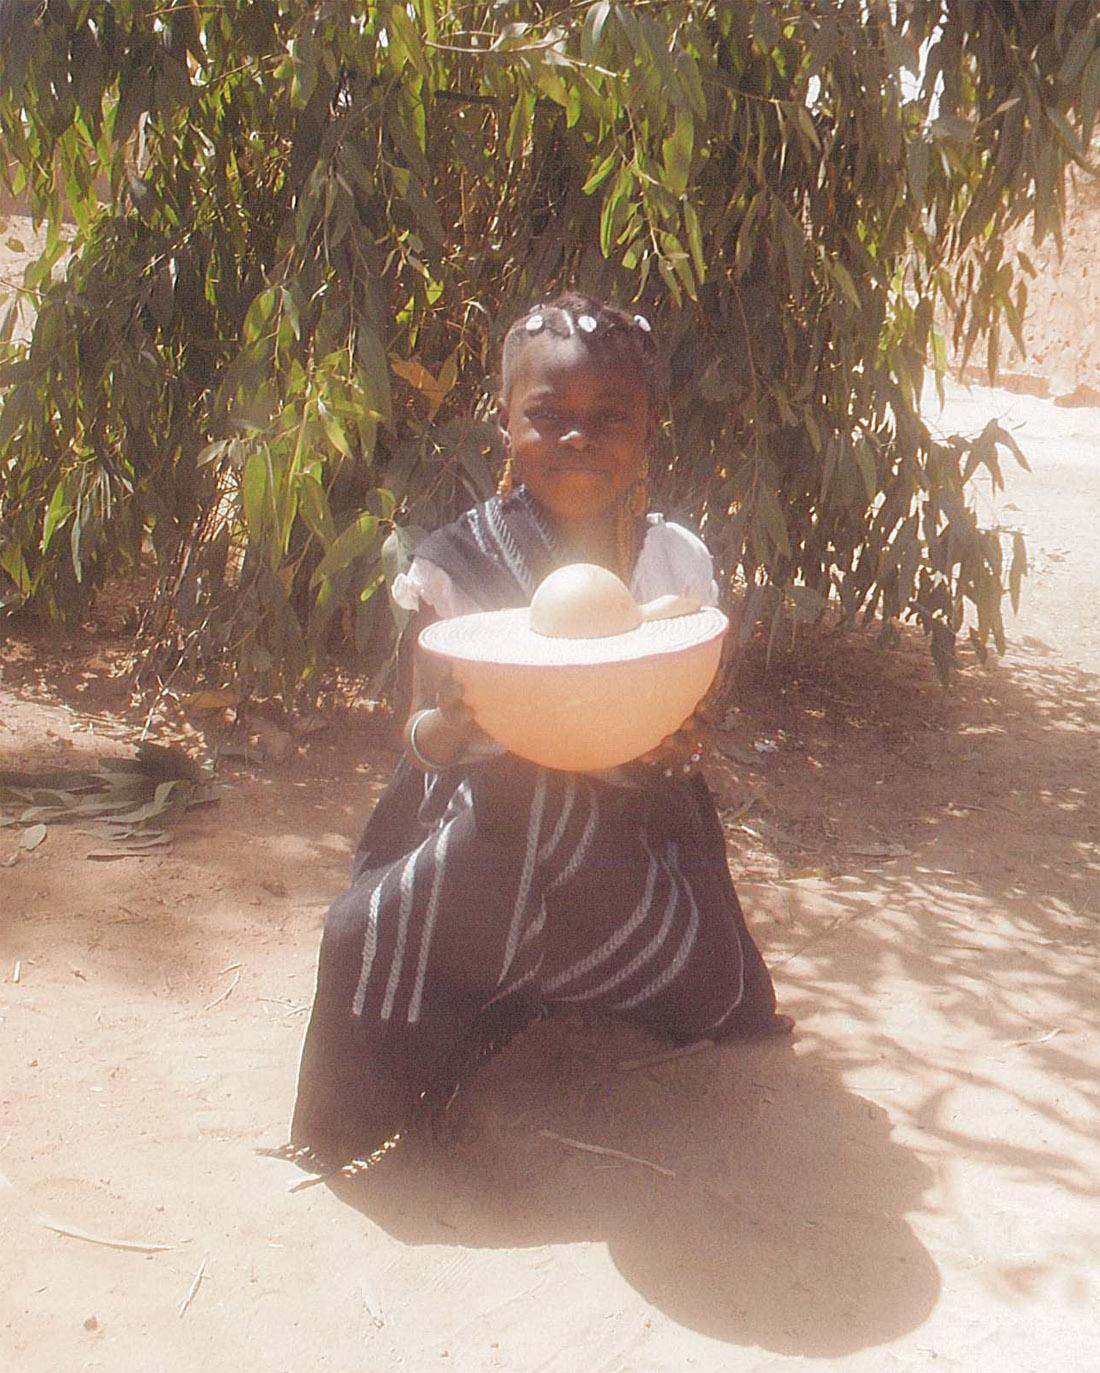 Enfant en habit traditionnel